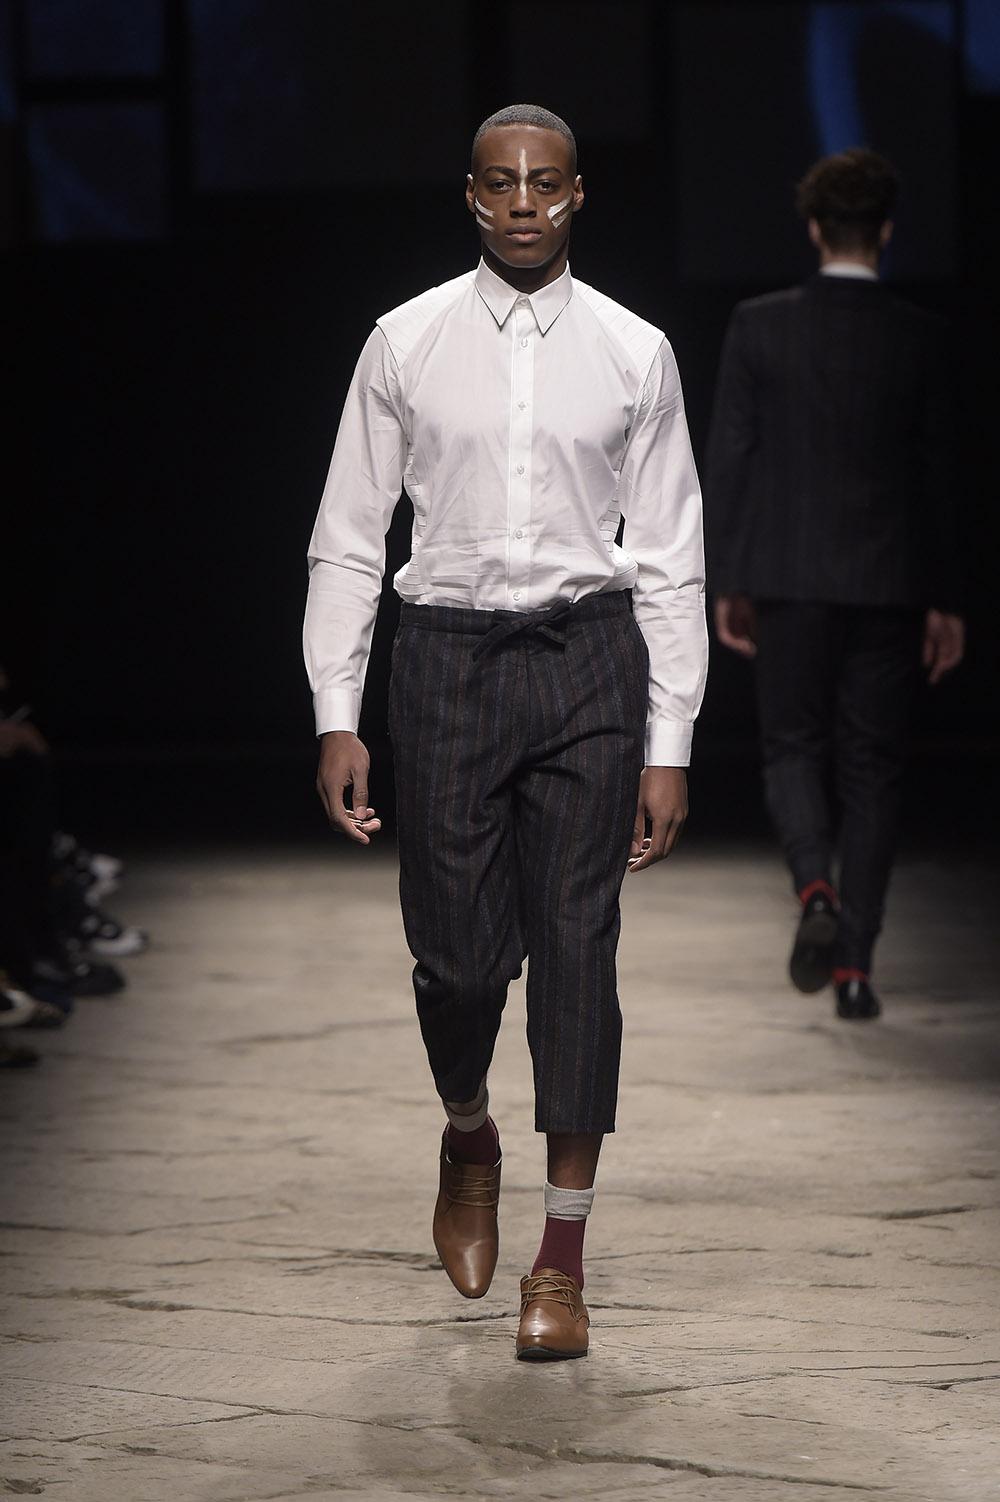 griot-mag-generation-africa-pitti-ethical-fashion-U.Mi-1 © Giovanni Giannoni-f